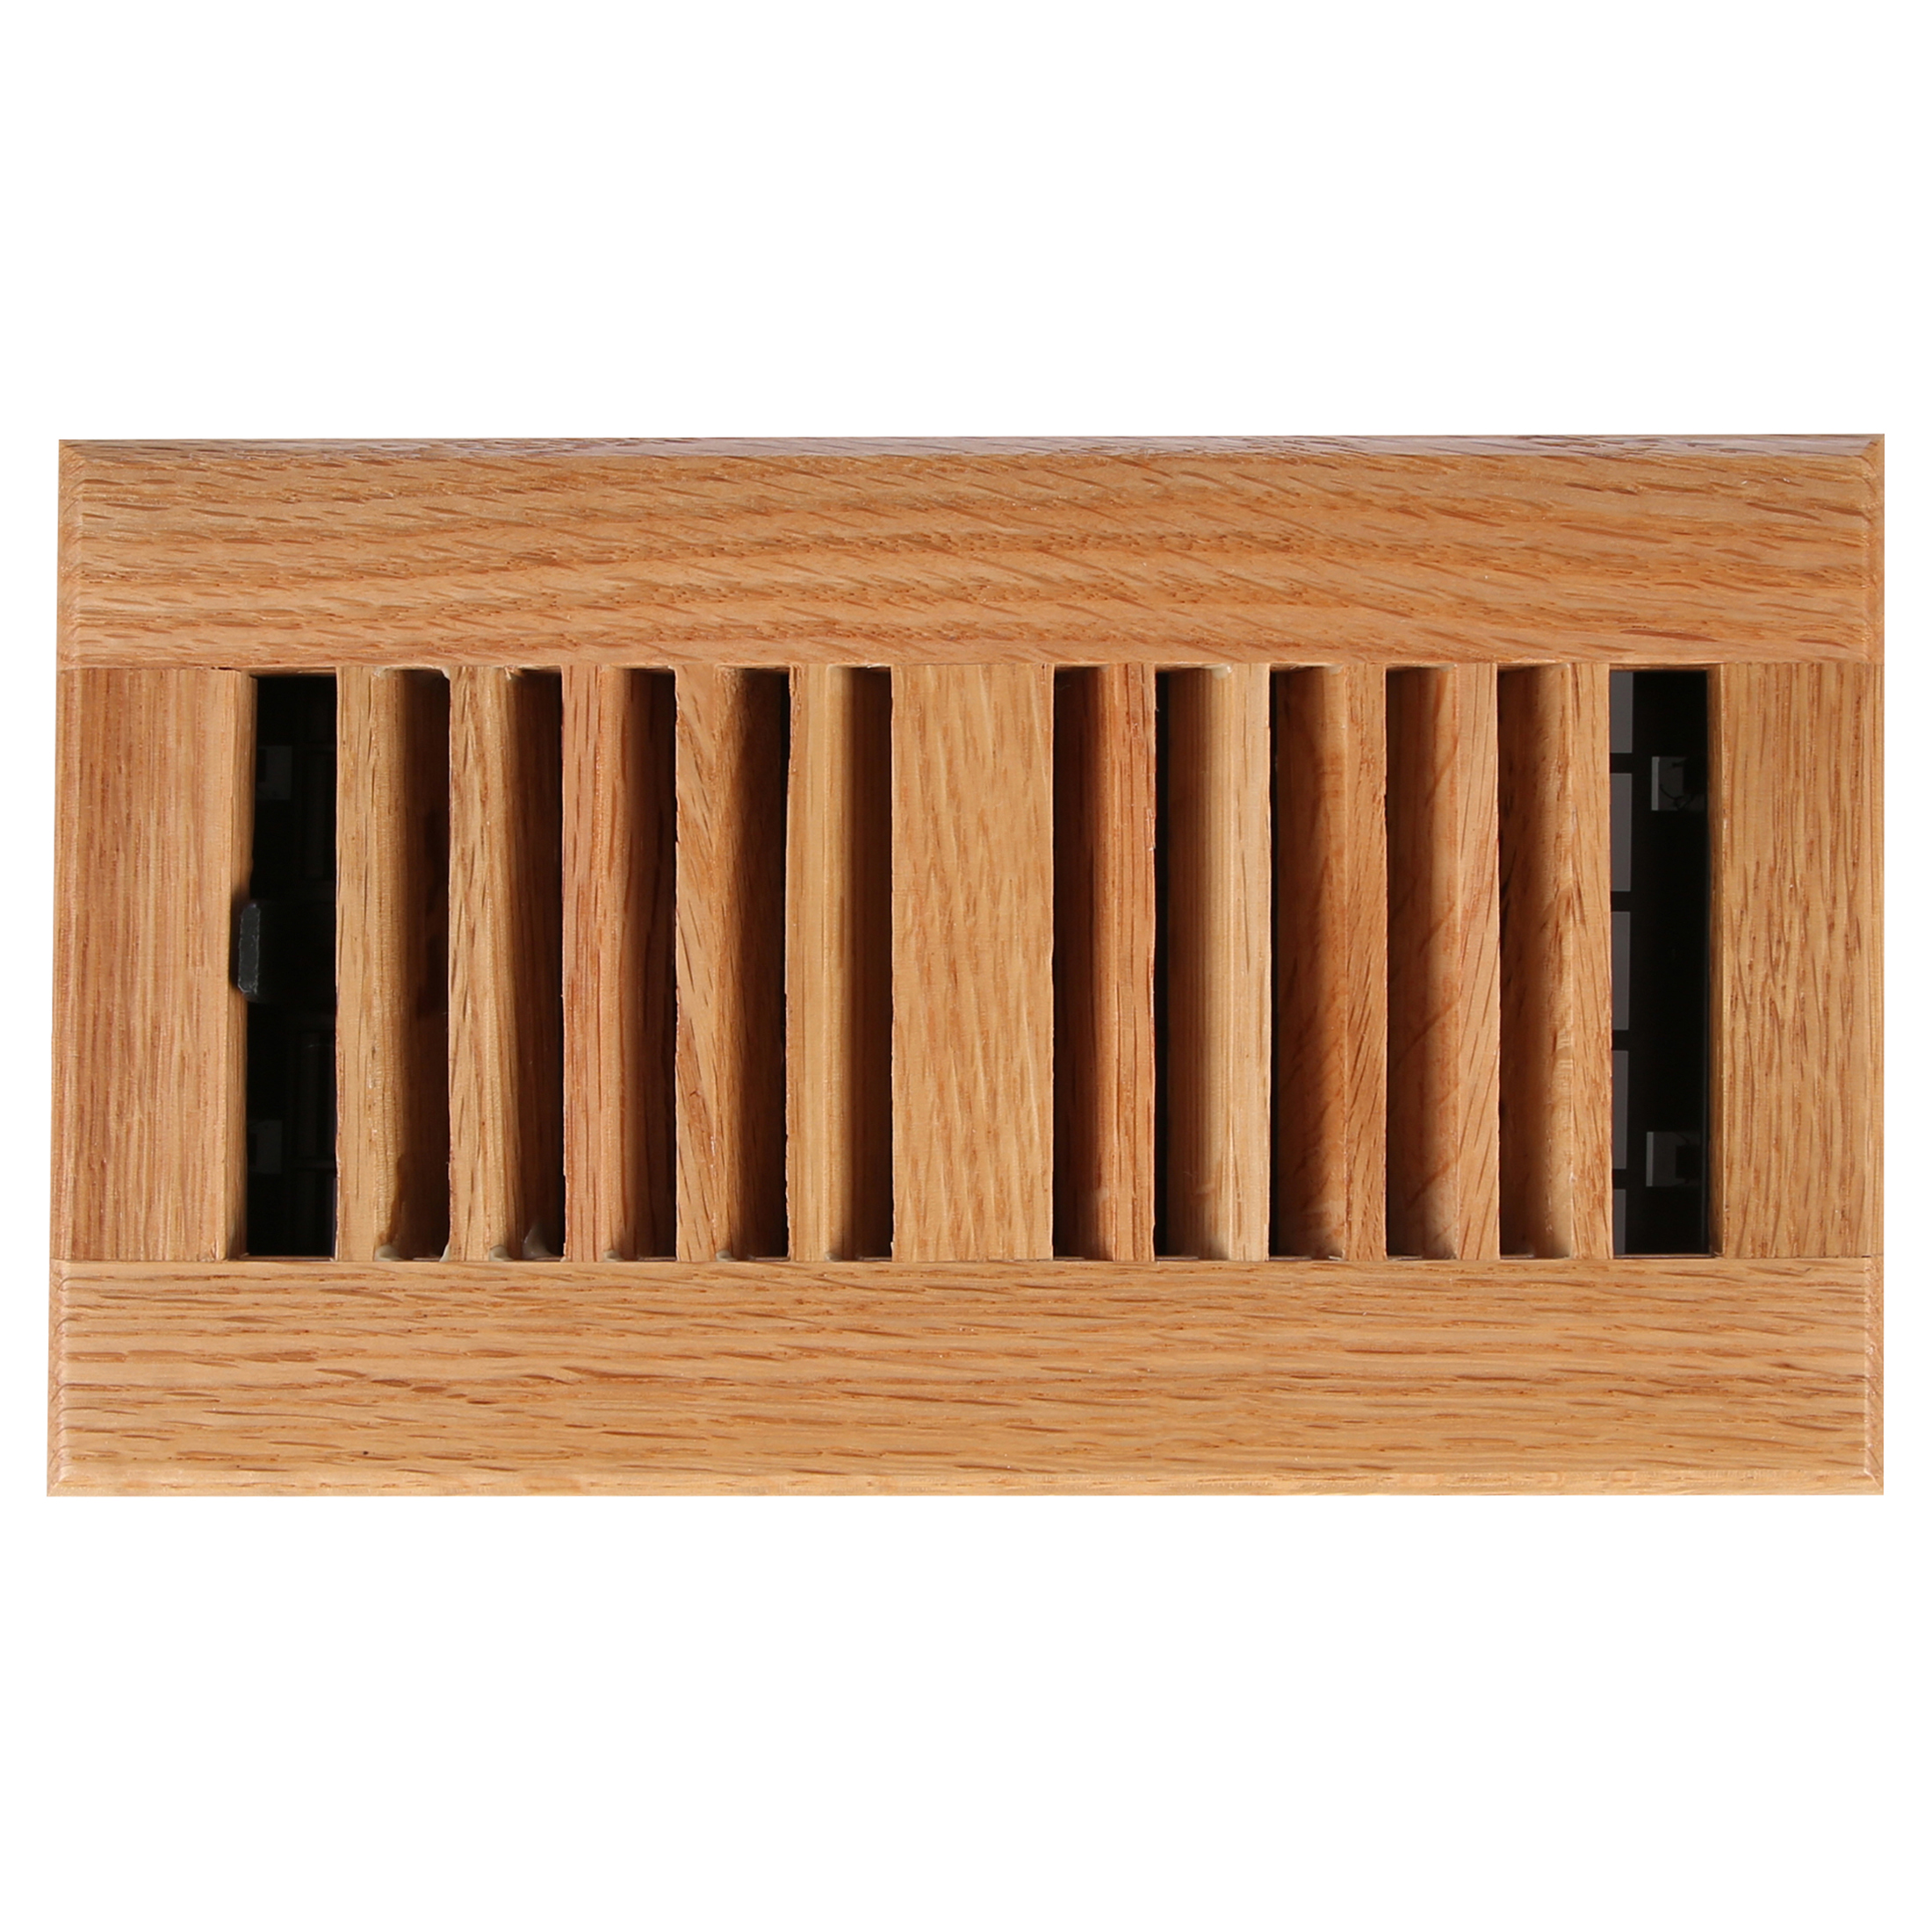 Decor Grates WL408-N Floor Register 4-Inch by 8-Inch Natural Oak